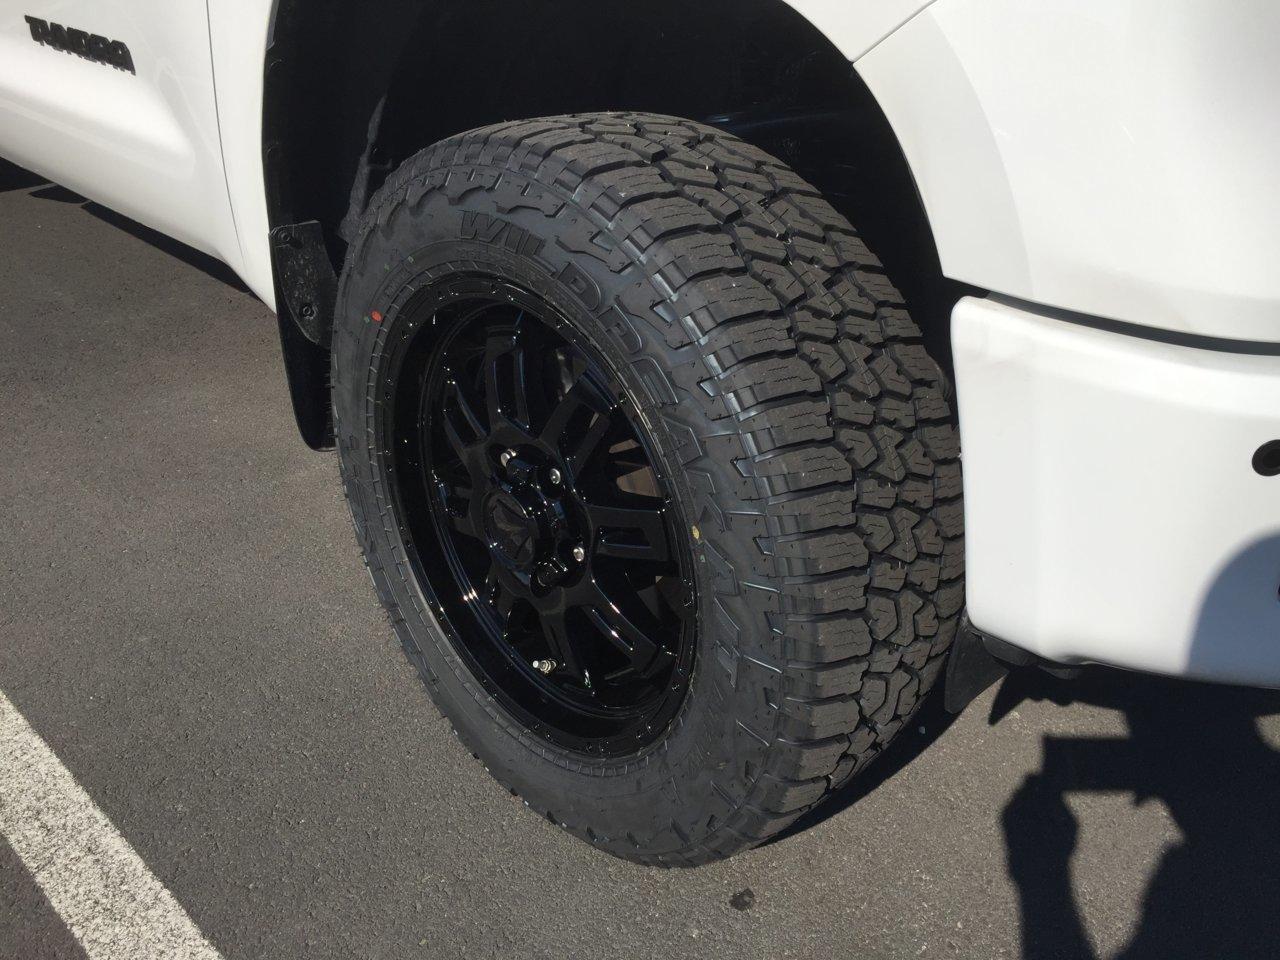 P275 65r18 Tires >> Finally got my new setup installed, custom TSS wheels and ...